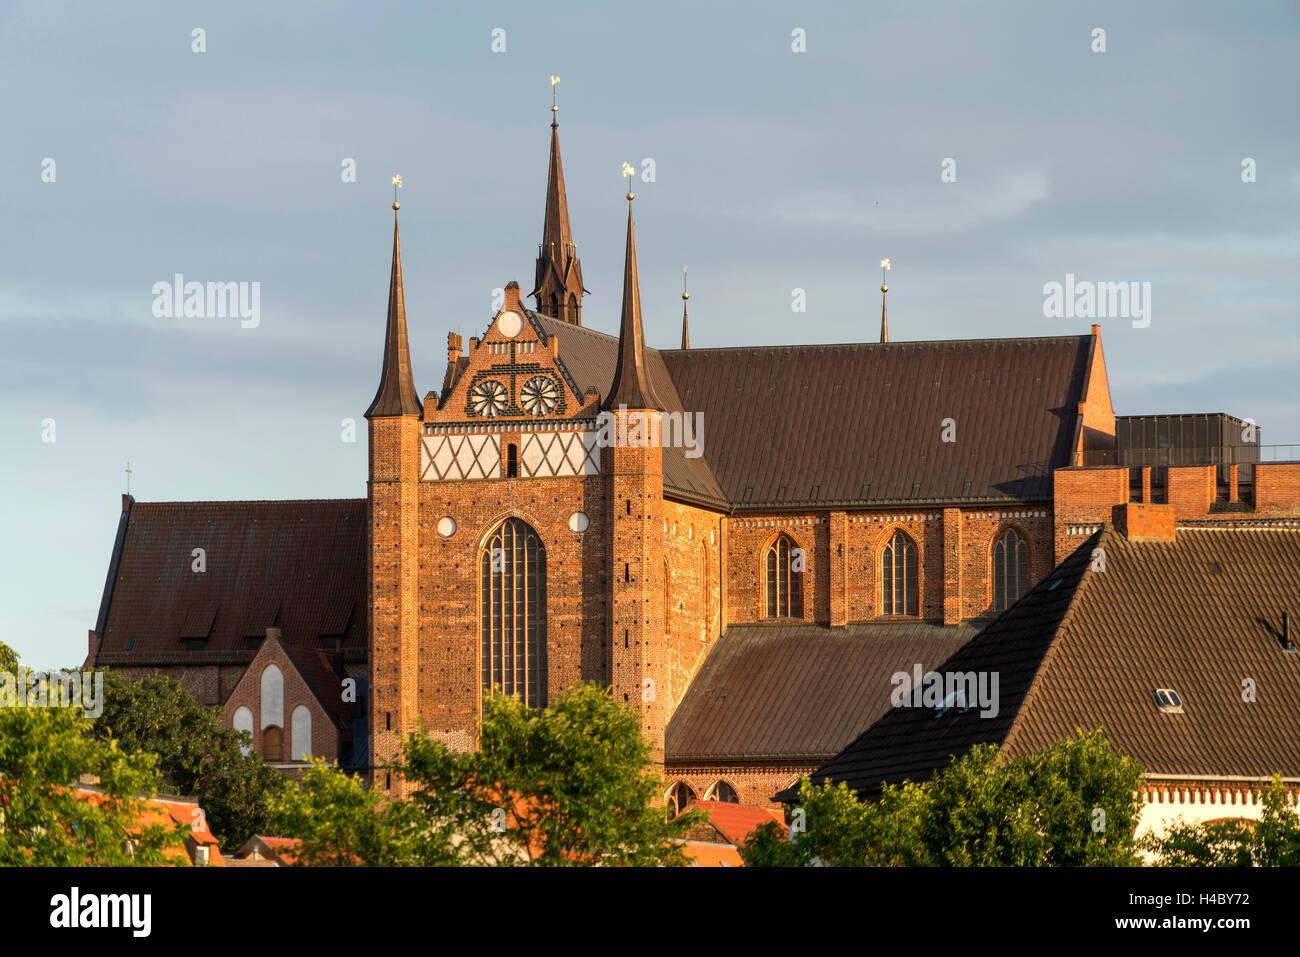 St. Georg Church, Hanseatic City of Wismar, Mecklenburg-Vorpommern, Germany - Stock Image